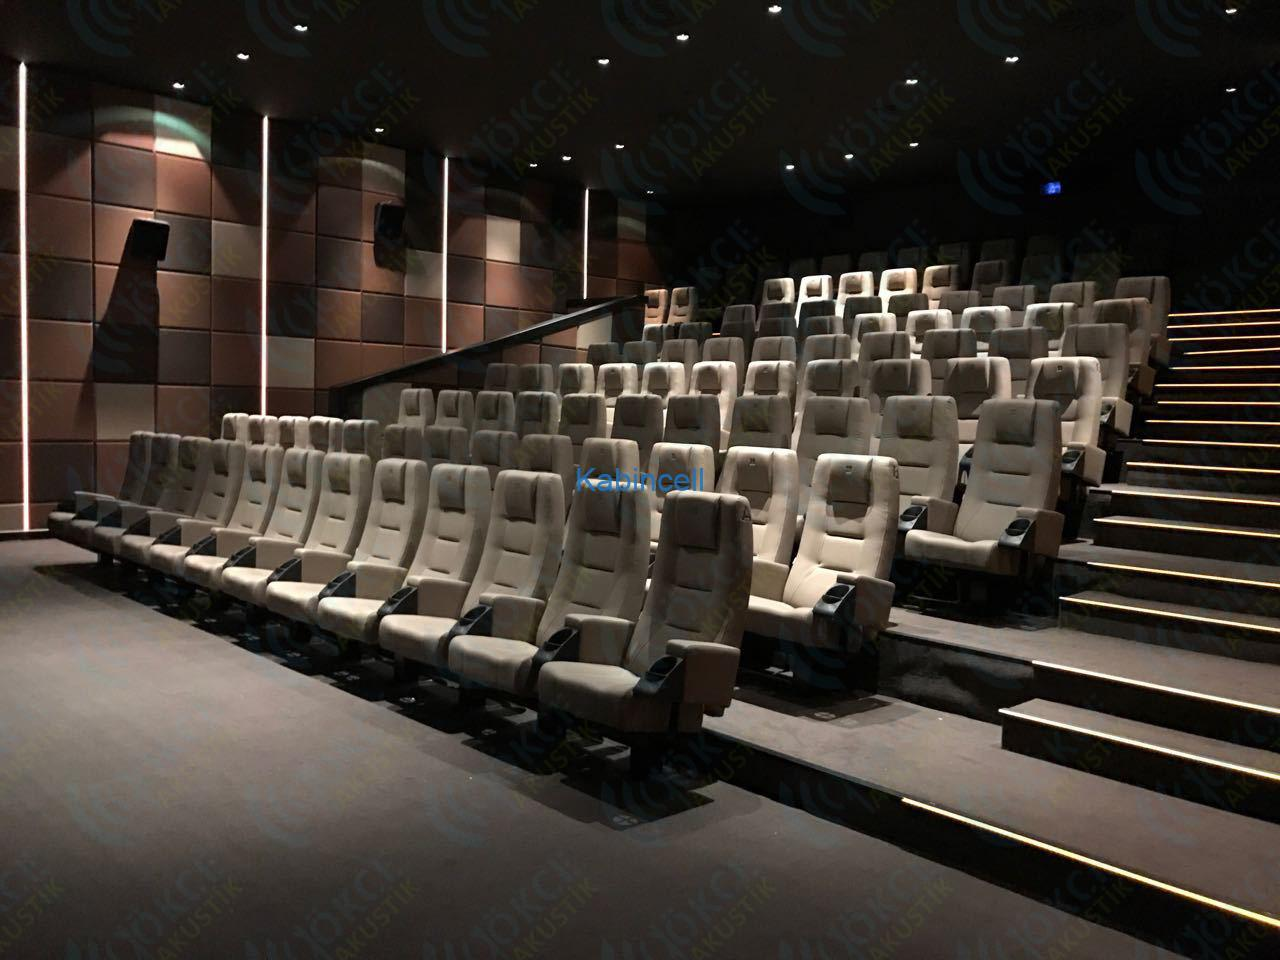 sinema-salonu-akustik-panel-kaplama-kumas-kapli-panel-parmephon03